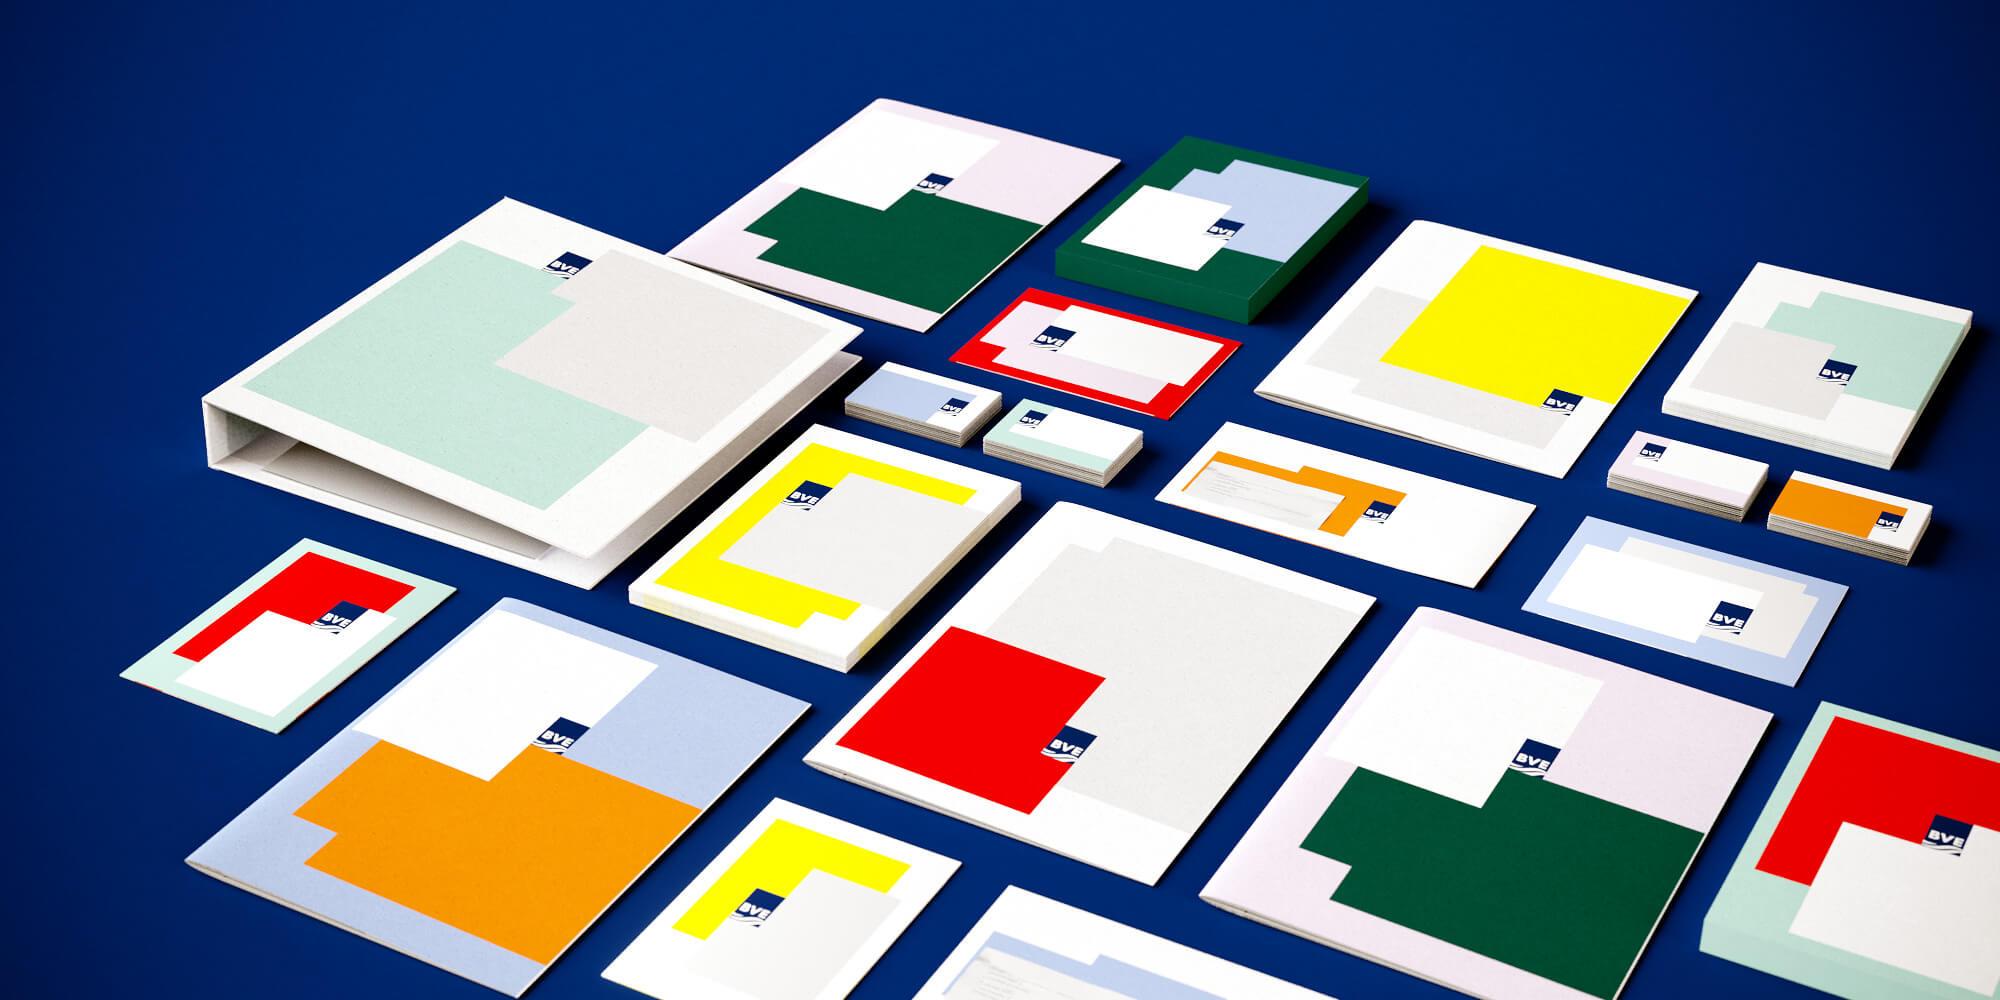 BVE Corporate Design Relaunch